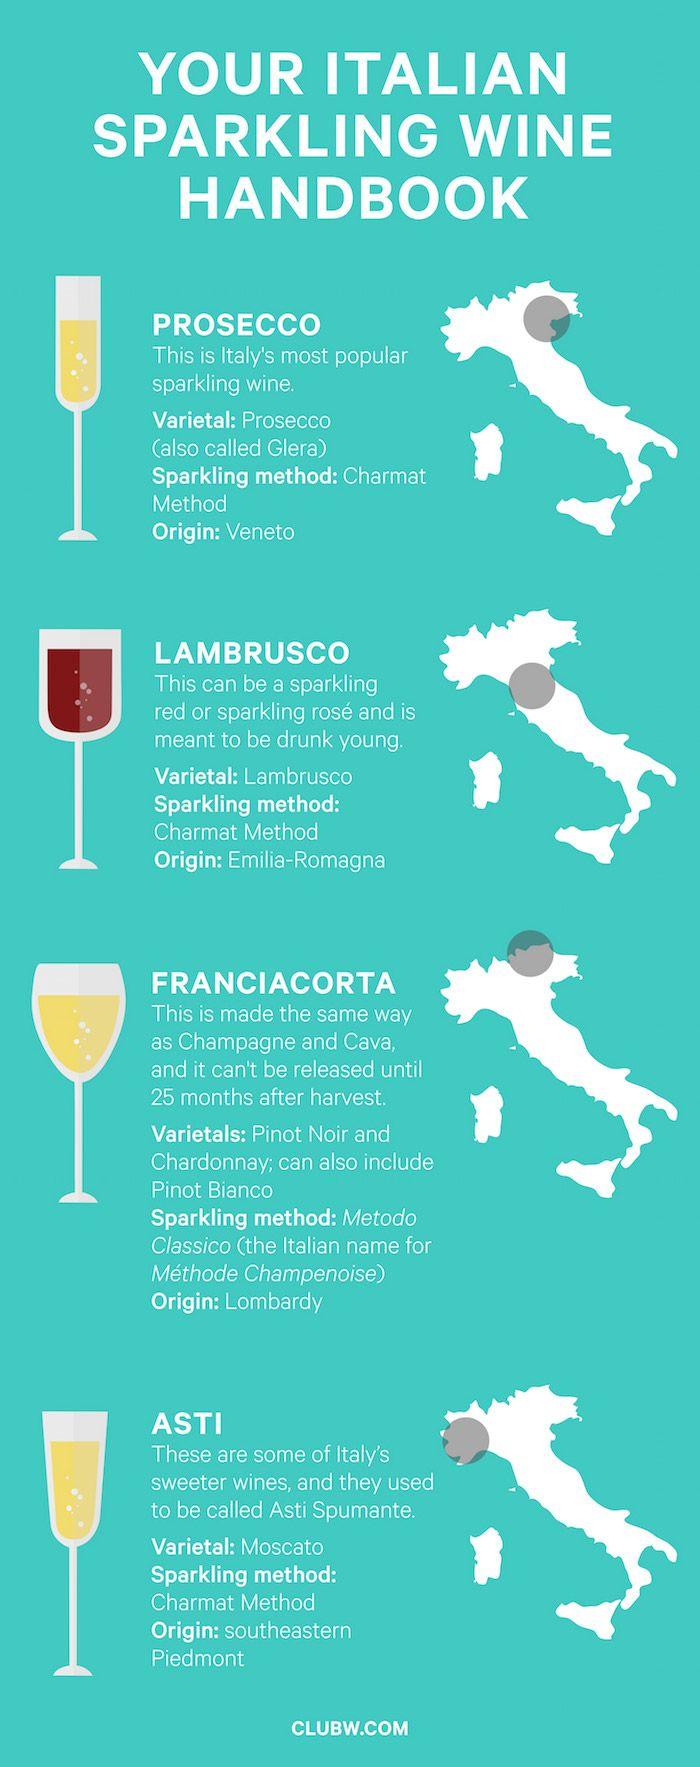 Frizzante? Spumante? // Your Italian Sparkling Wine Handbook - The Juice | Club W                                                                                                                                                                                 More